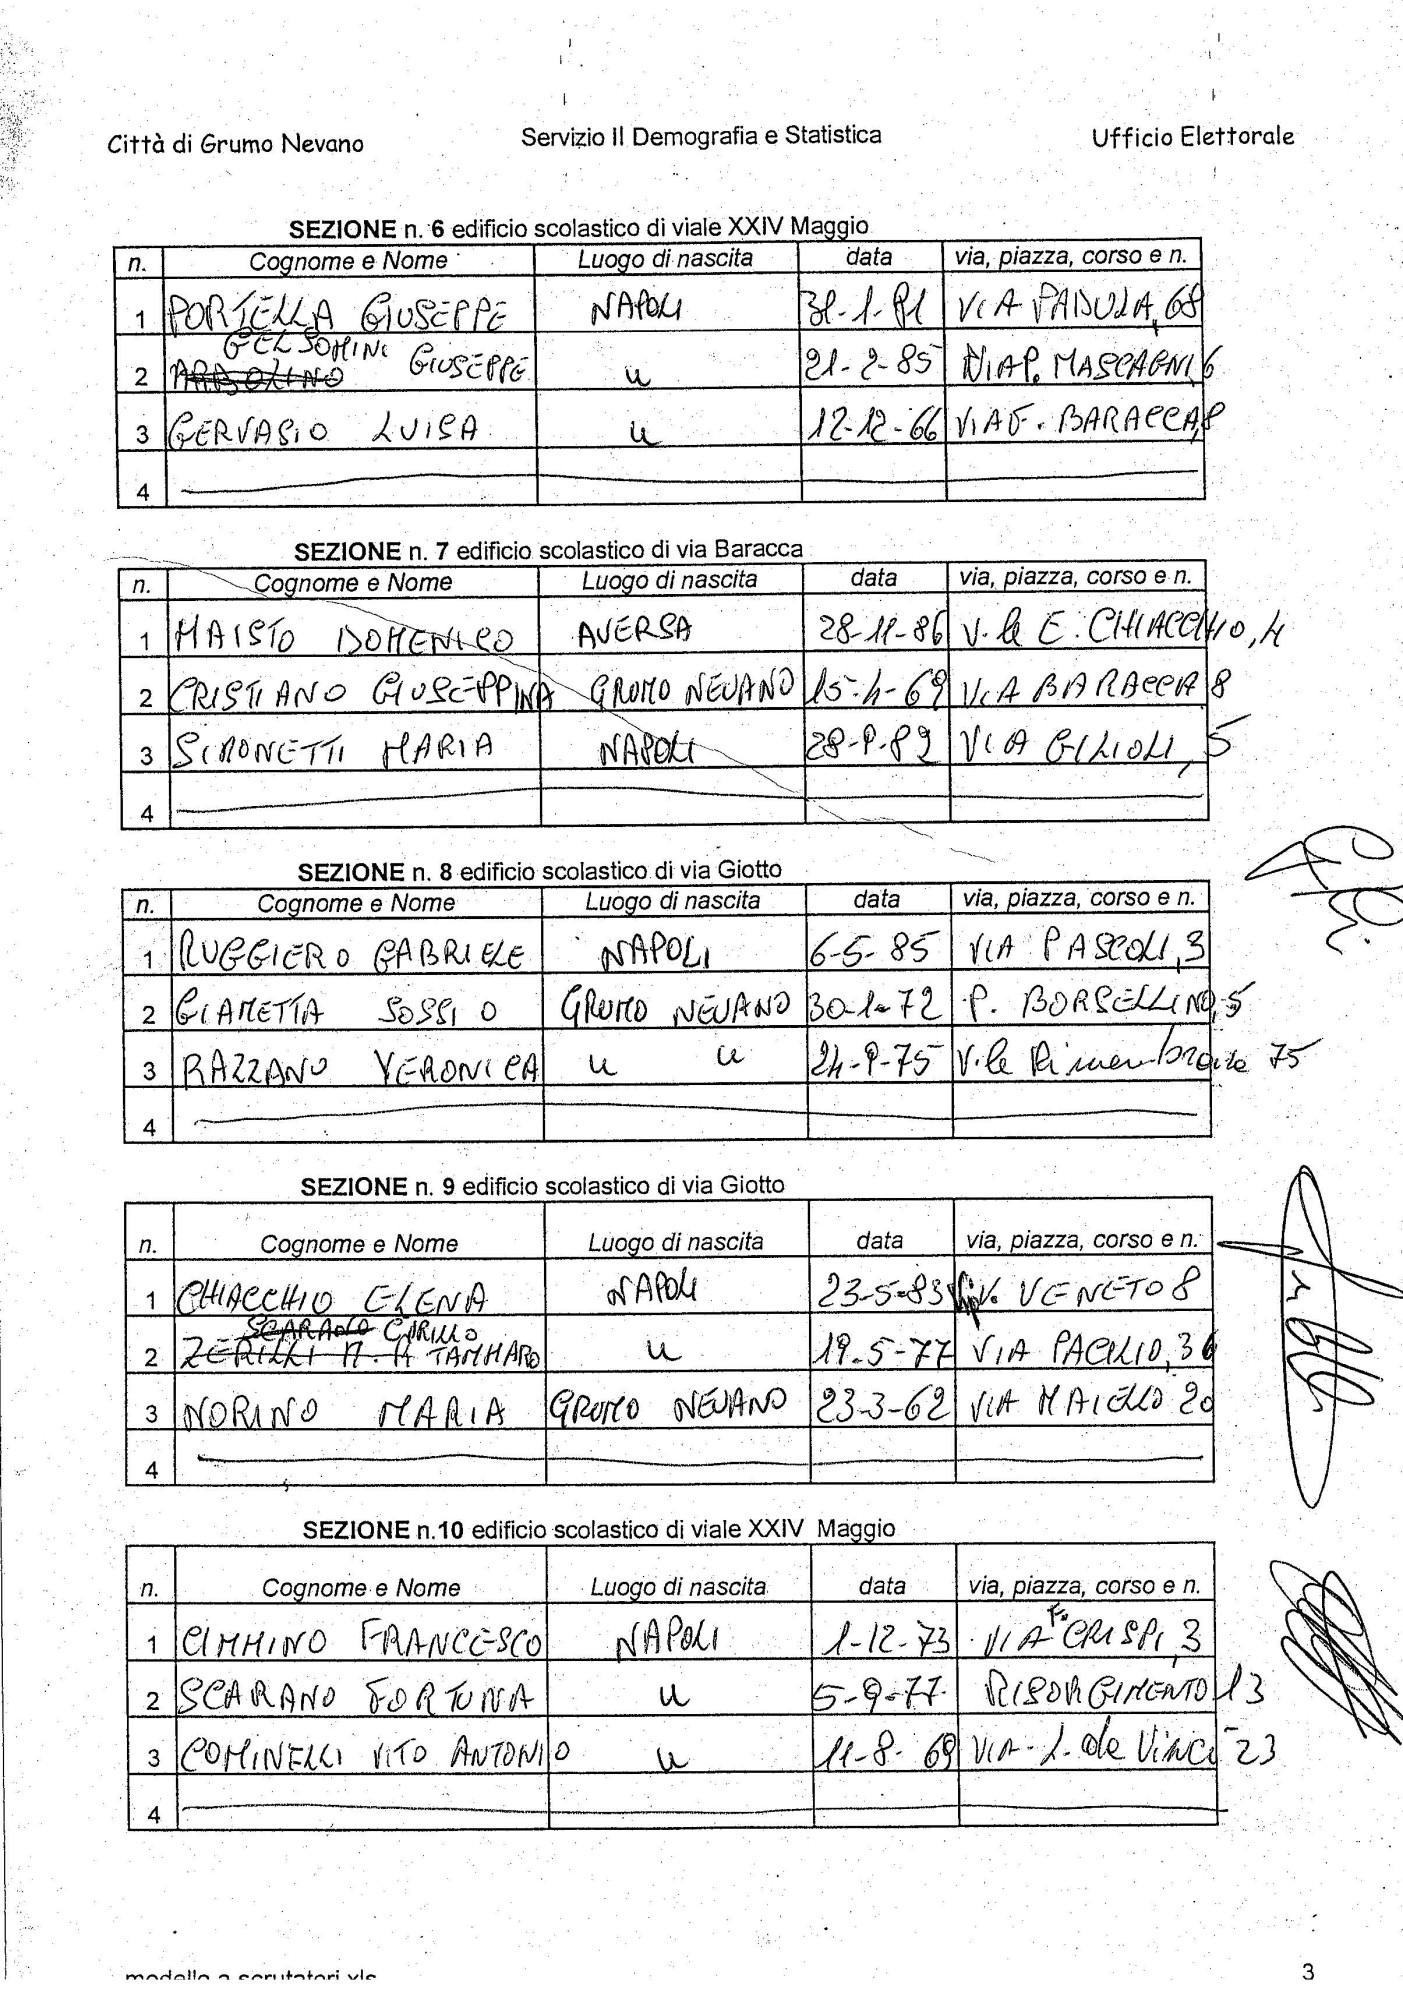 Elenco scrutatori nominati_Pagina_2